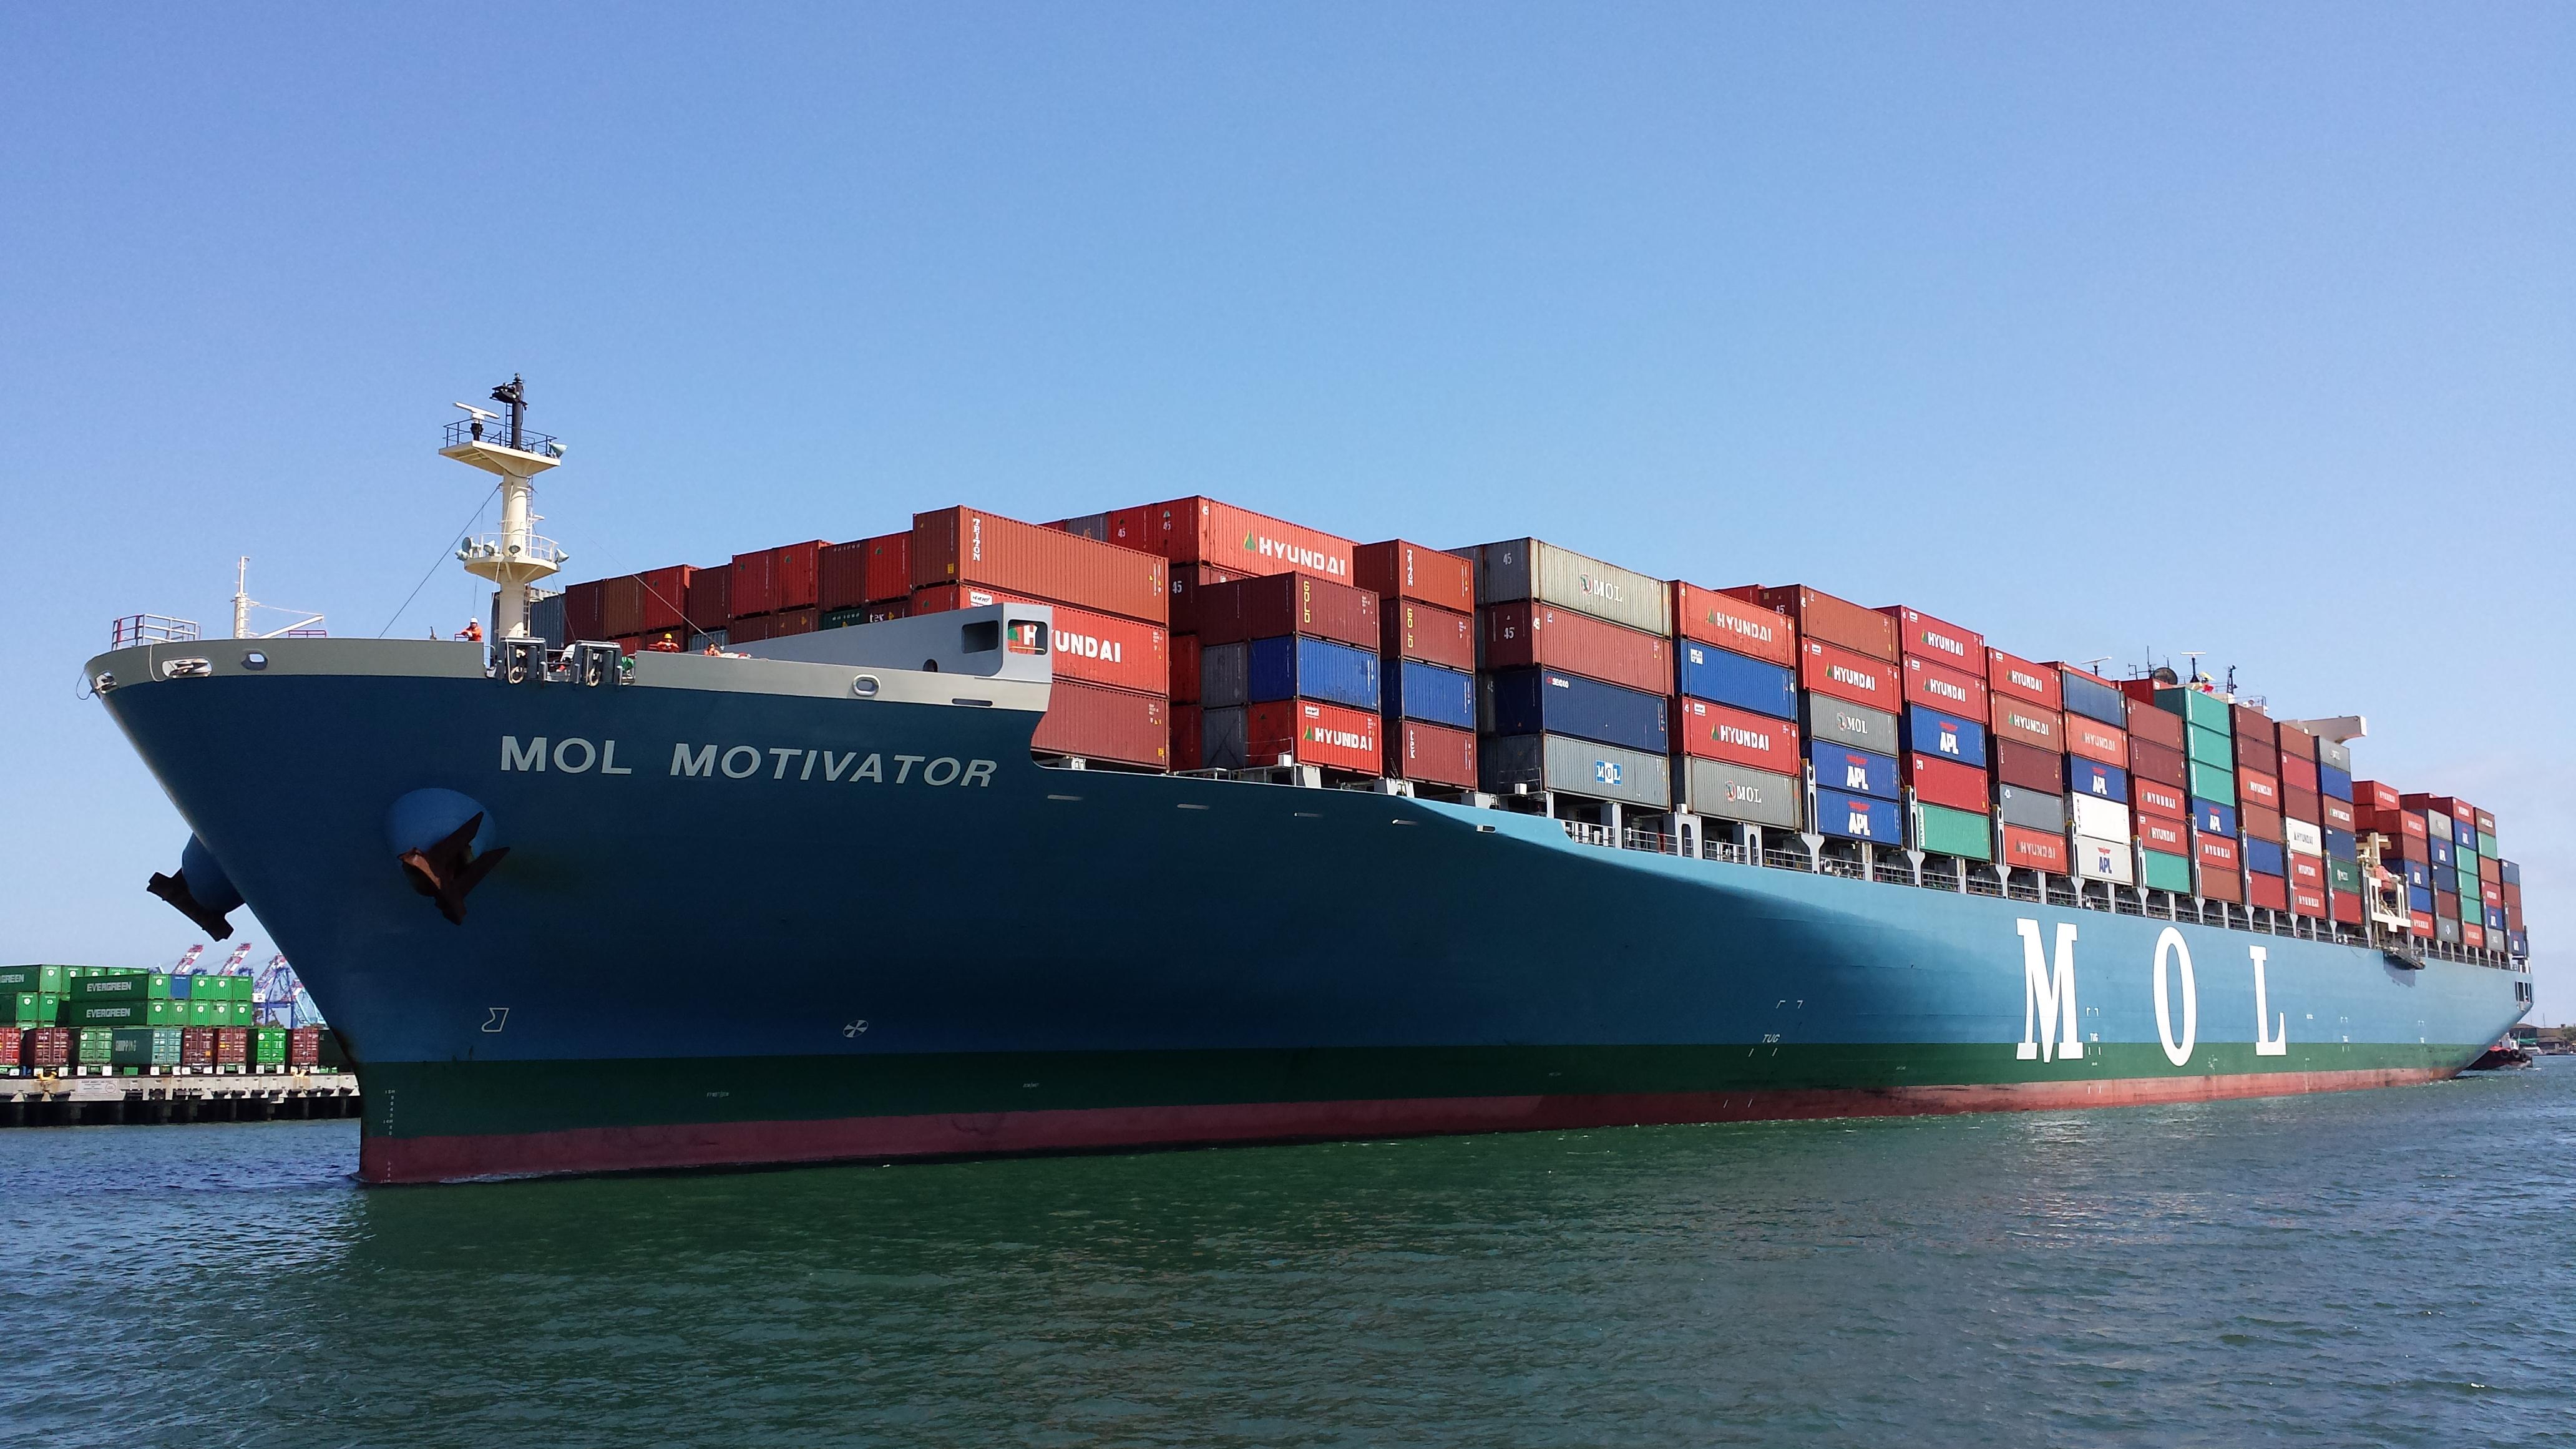 mol container ship